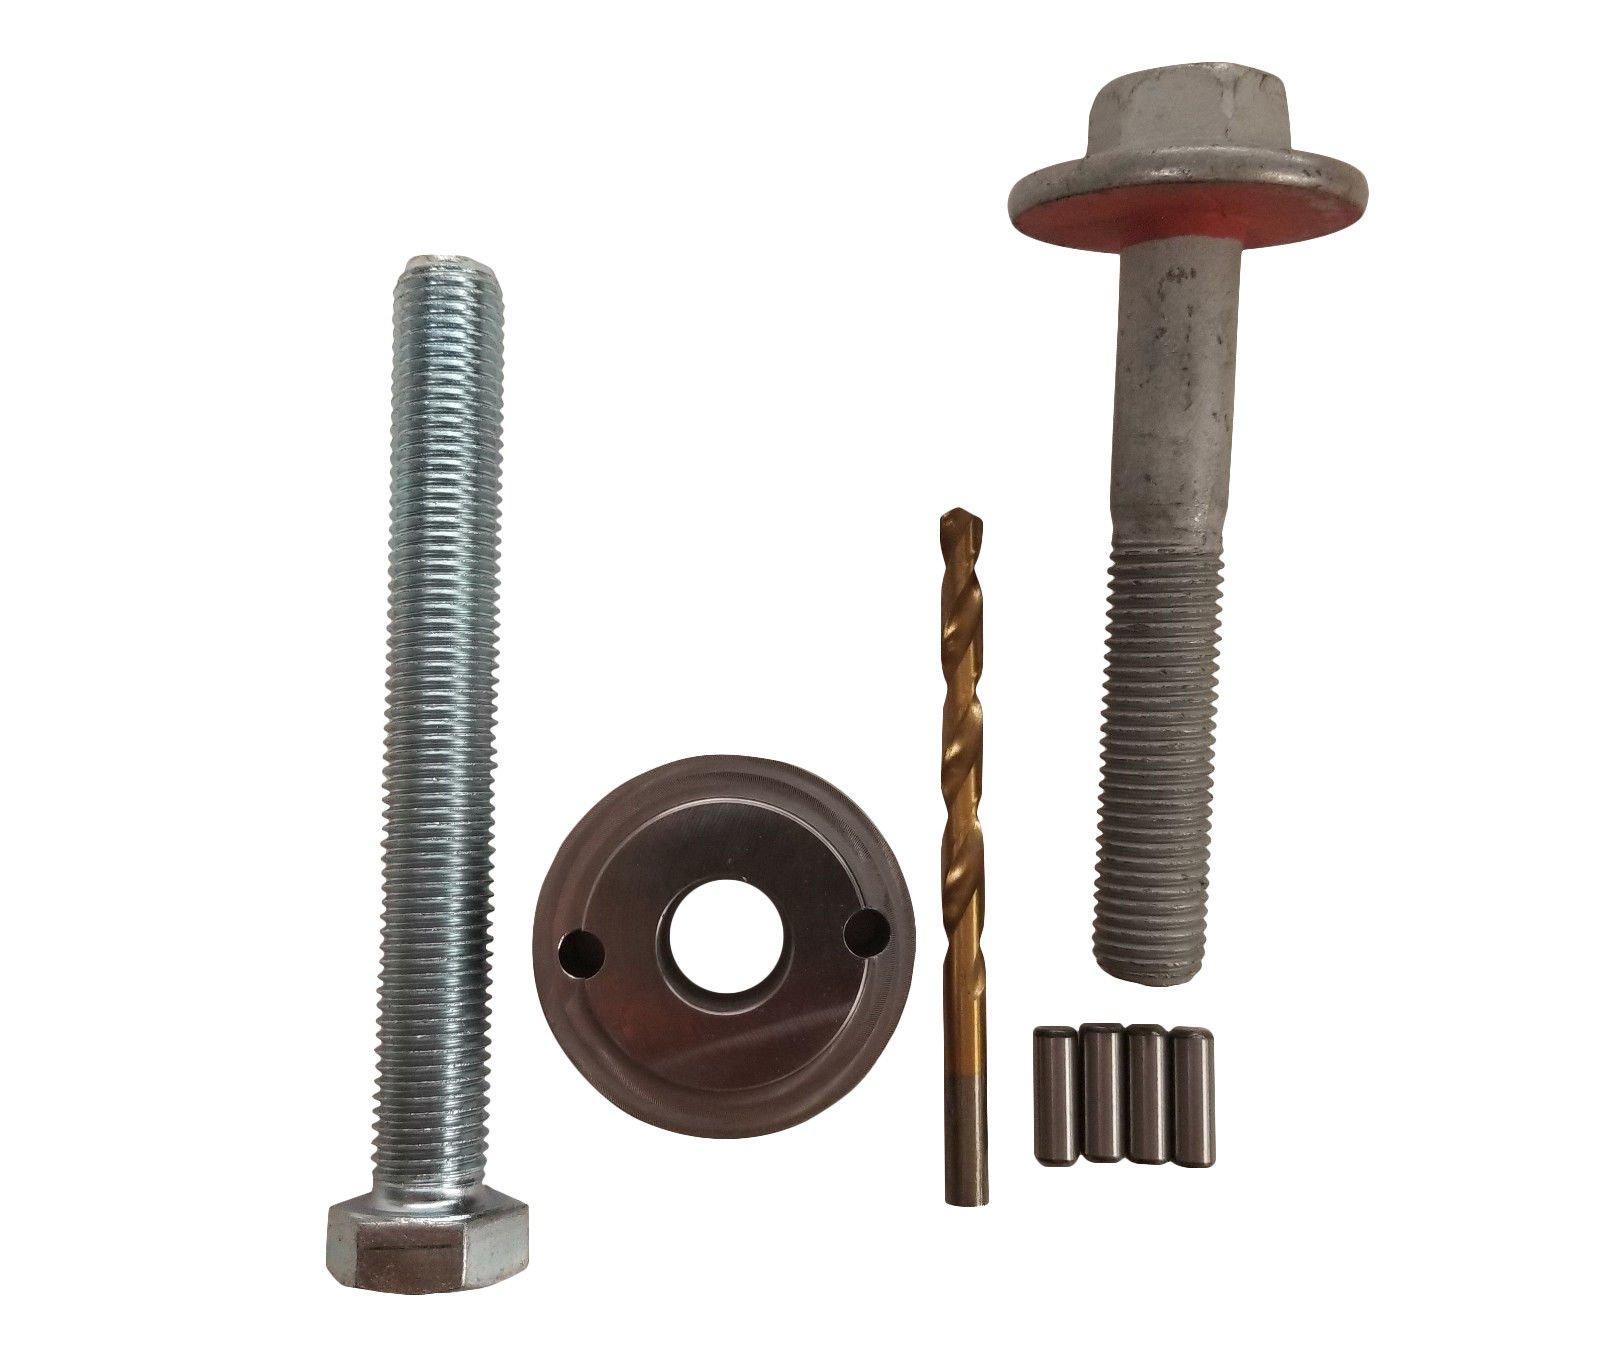 LS Crank Pin Kit LS Harmonic Dampener With Bolt